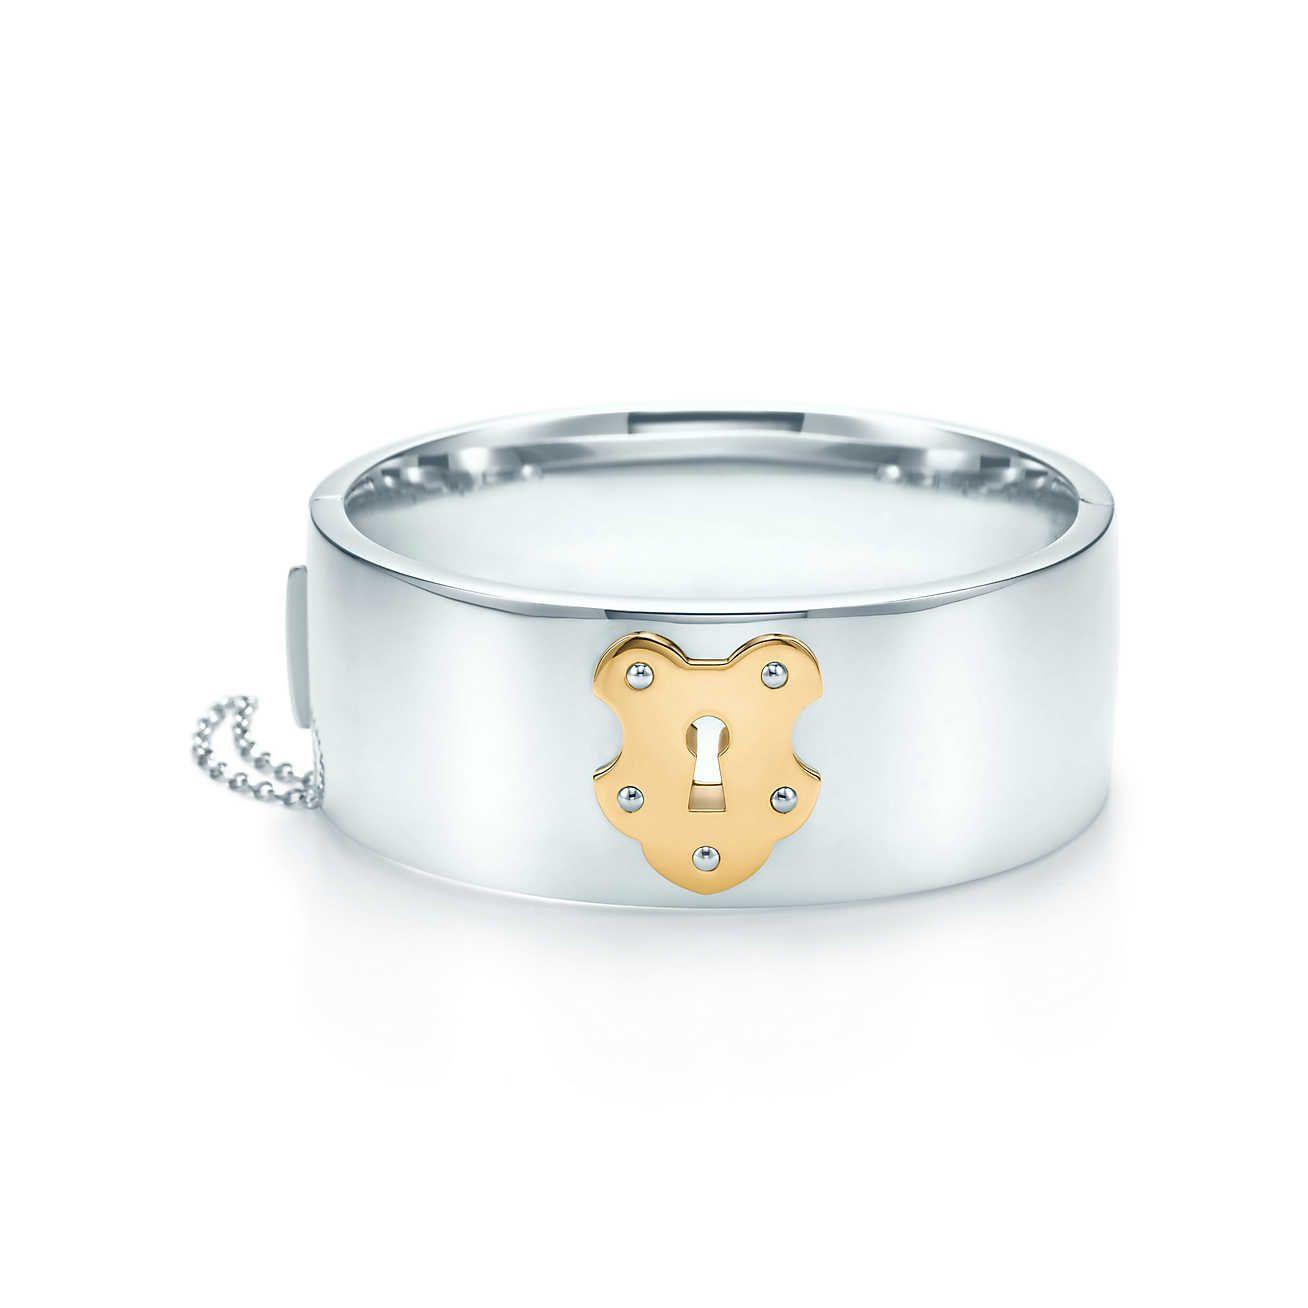 bf7e0ffde Tiffany Locks:Vintage Lock Bangle | Bling & Bags (Accessories ...